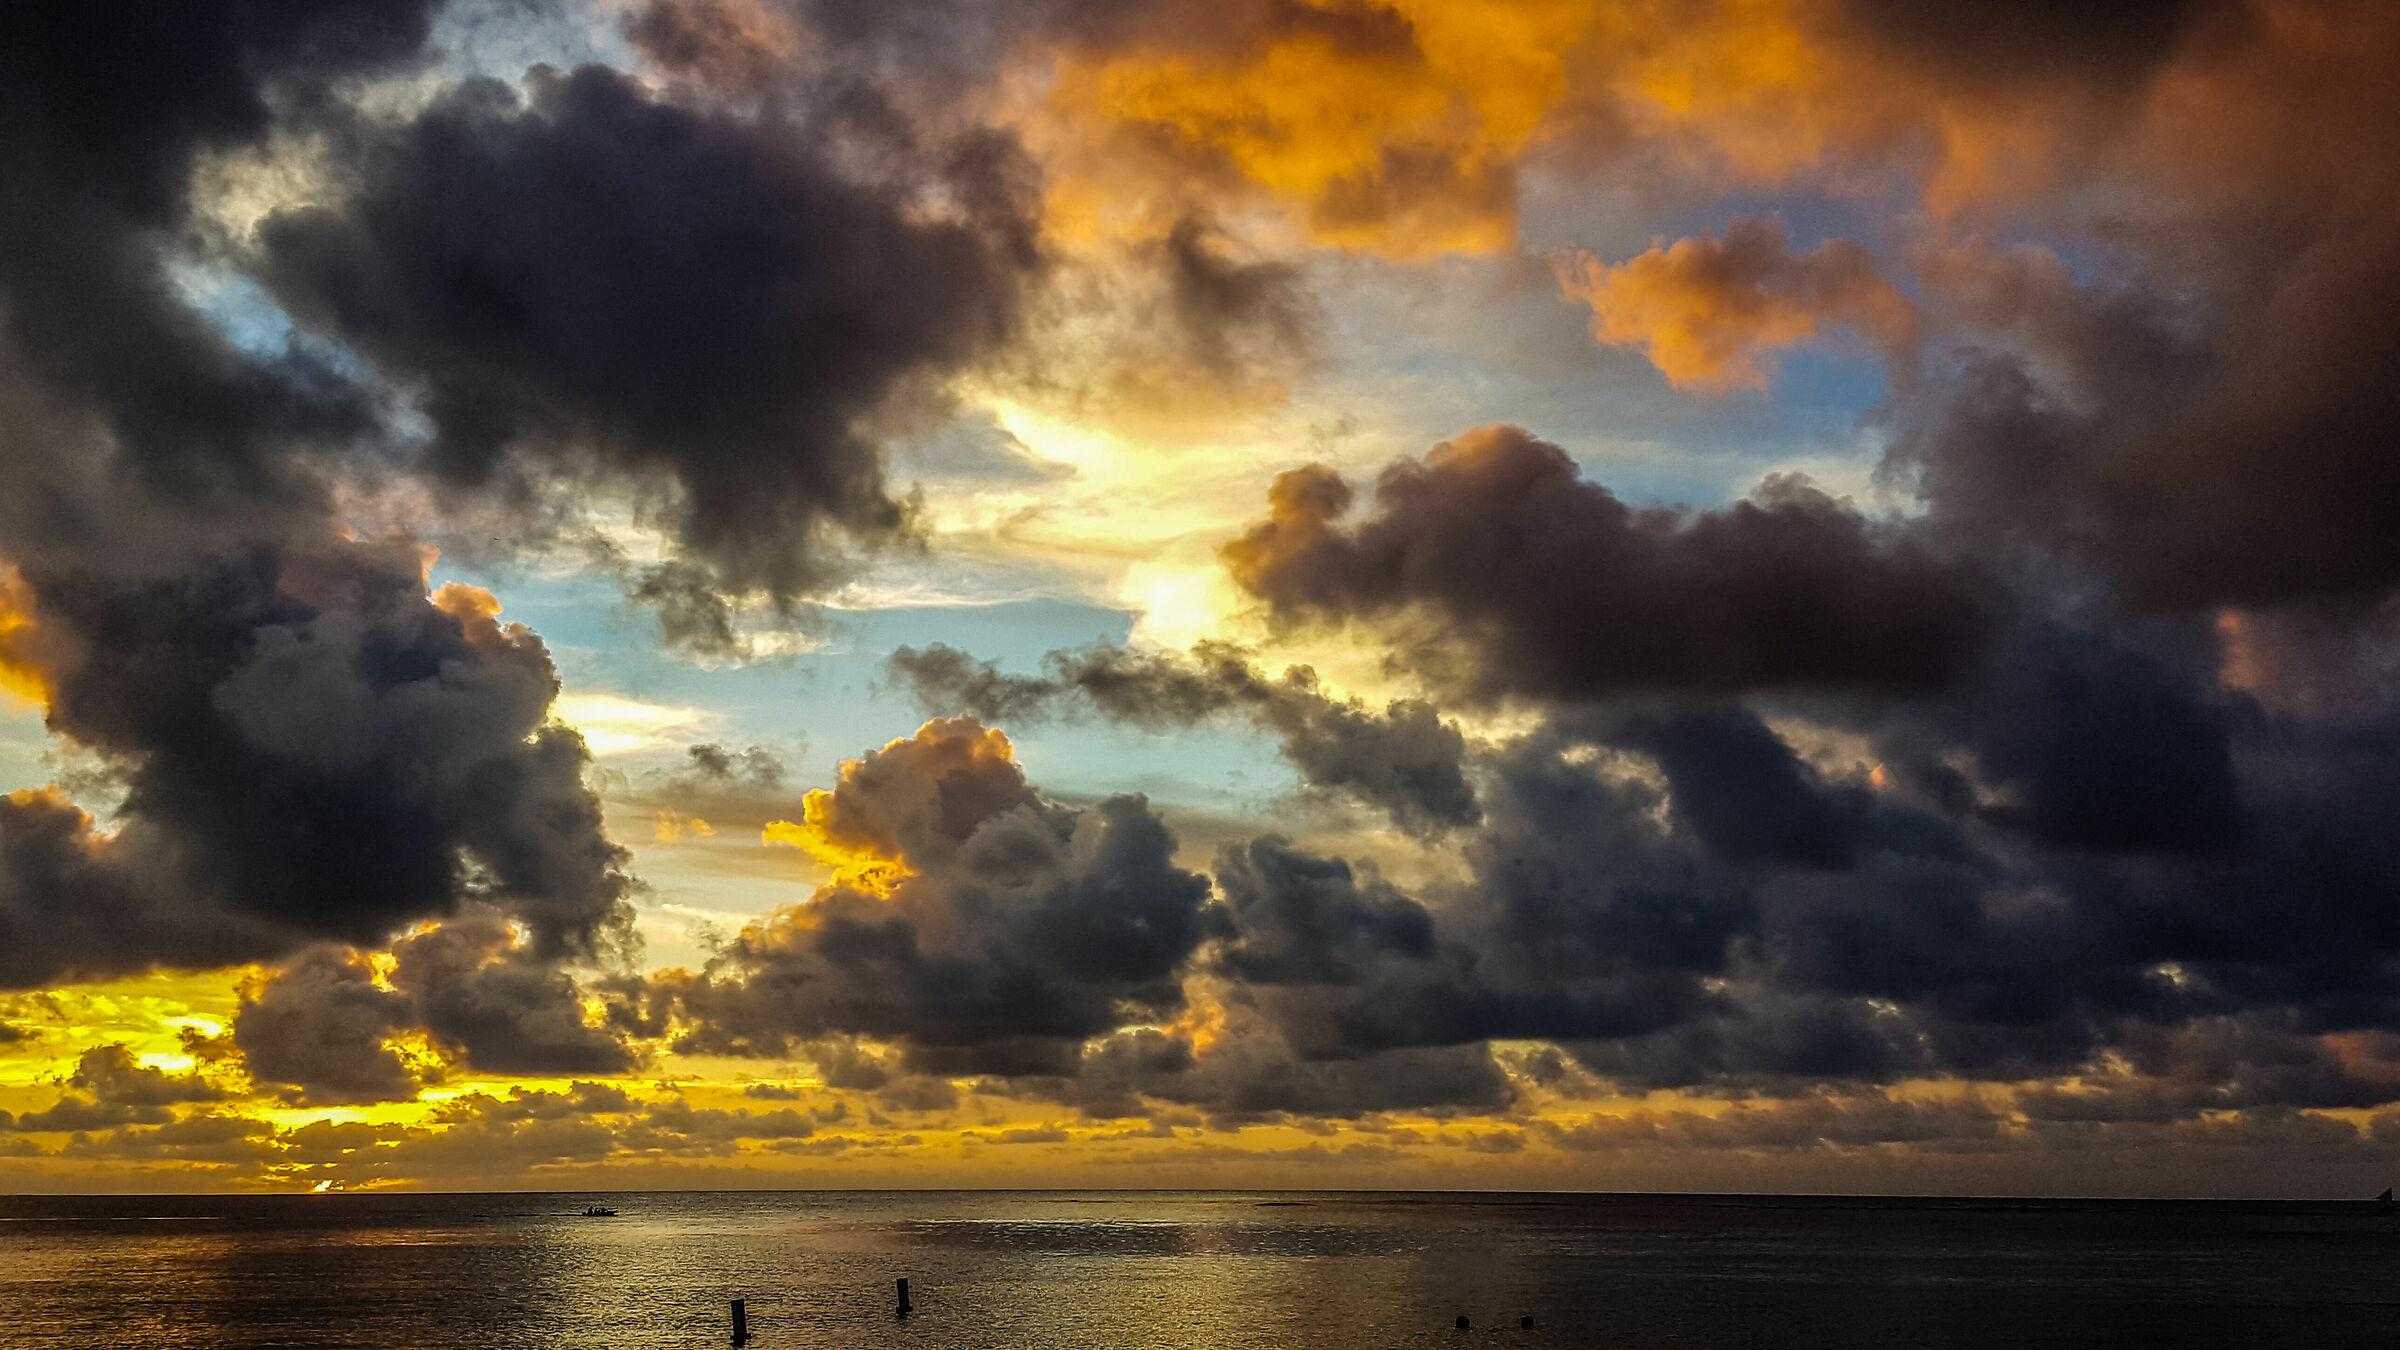 Sunset in Hanalei bay, Kauai...